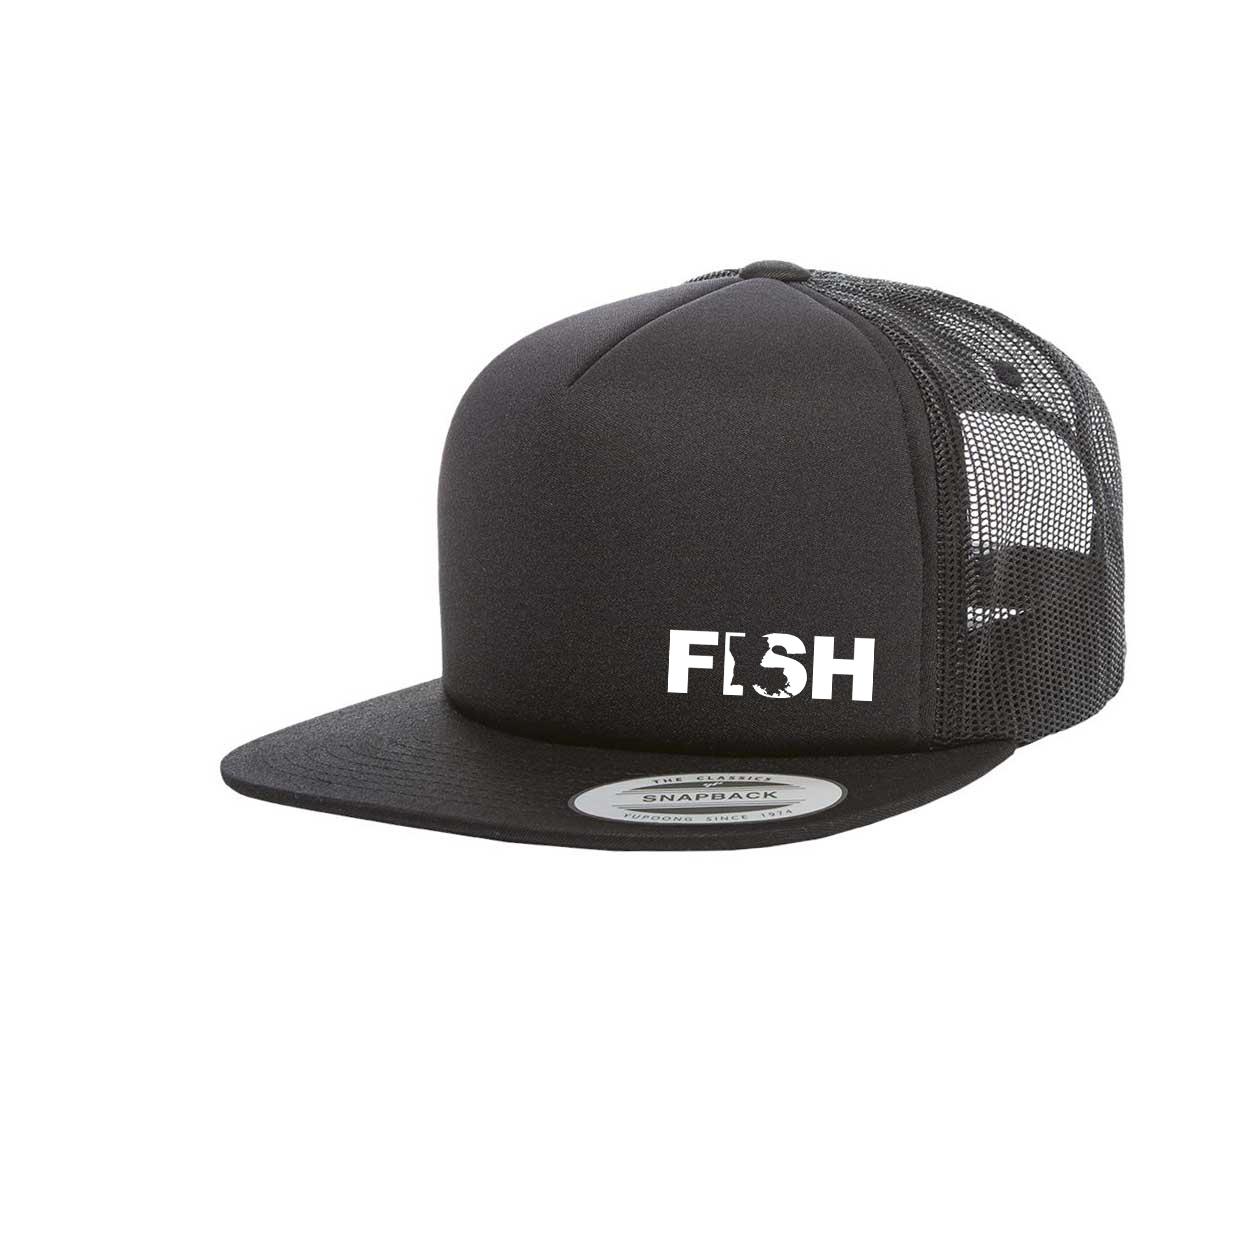 Fish Louisiana Night Out Premium Foam Flat Brim Snapback Hat Black (White Logo)